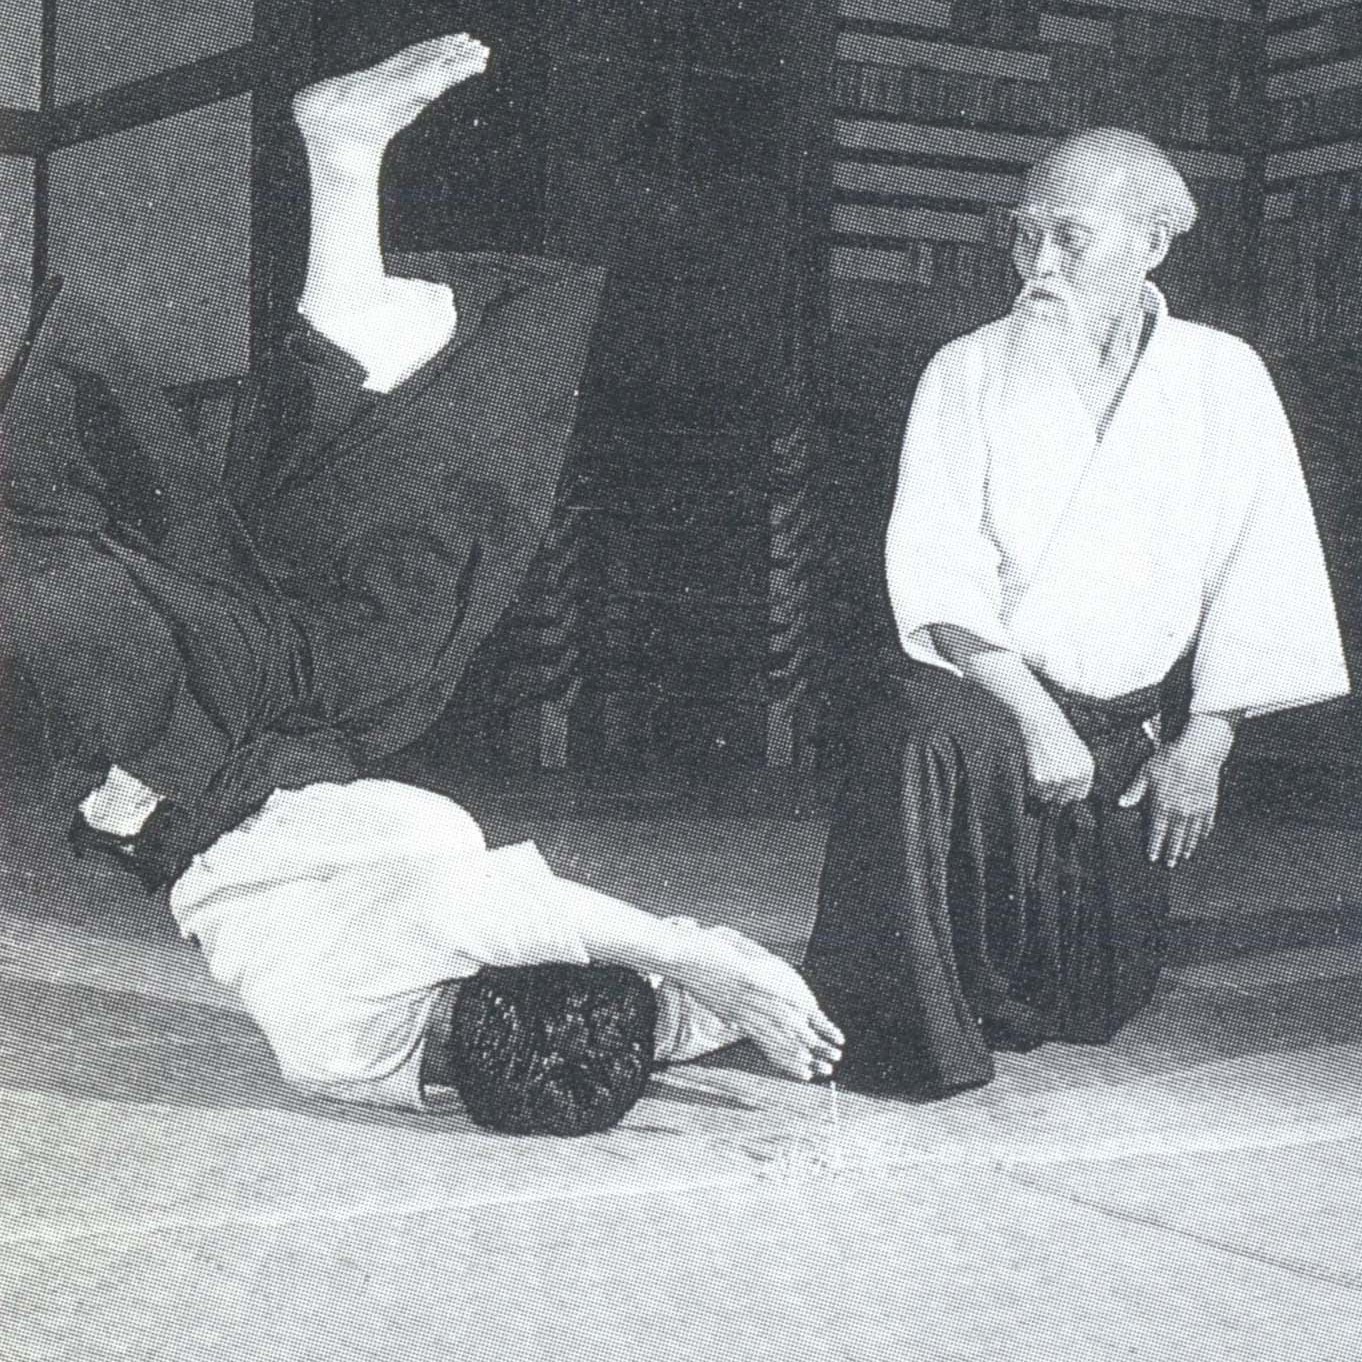 O-Sensei-Morihei-UESHIBA-3